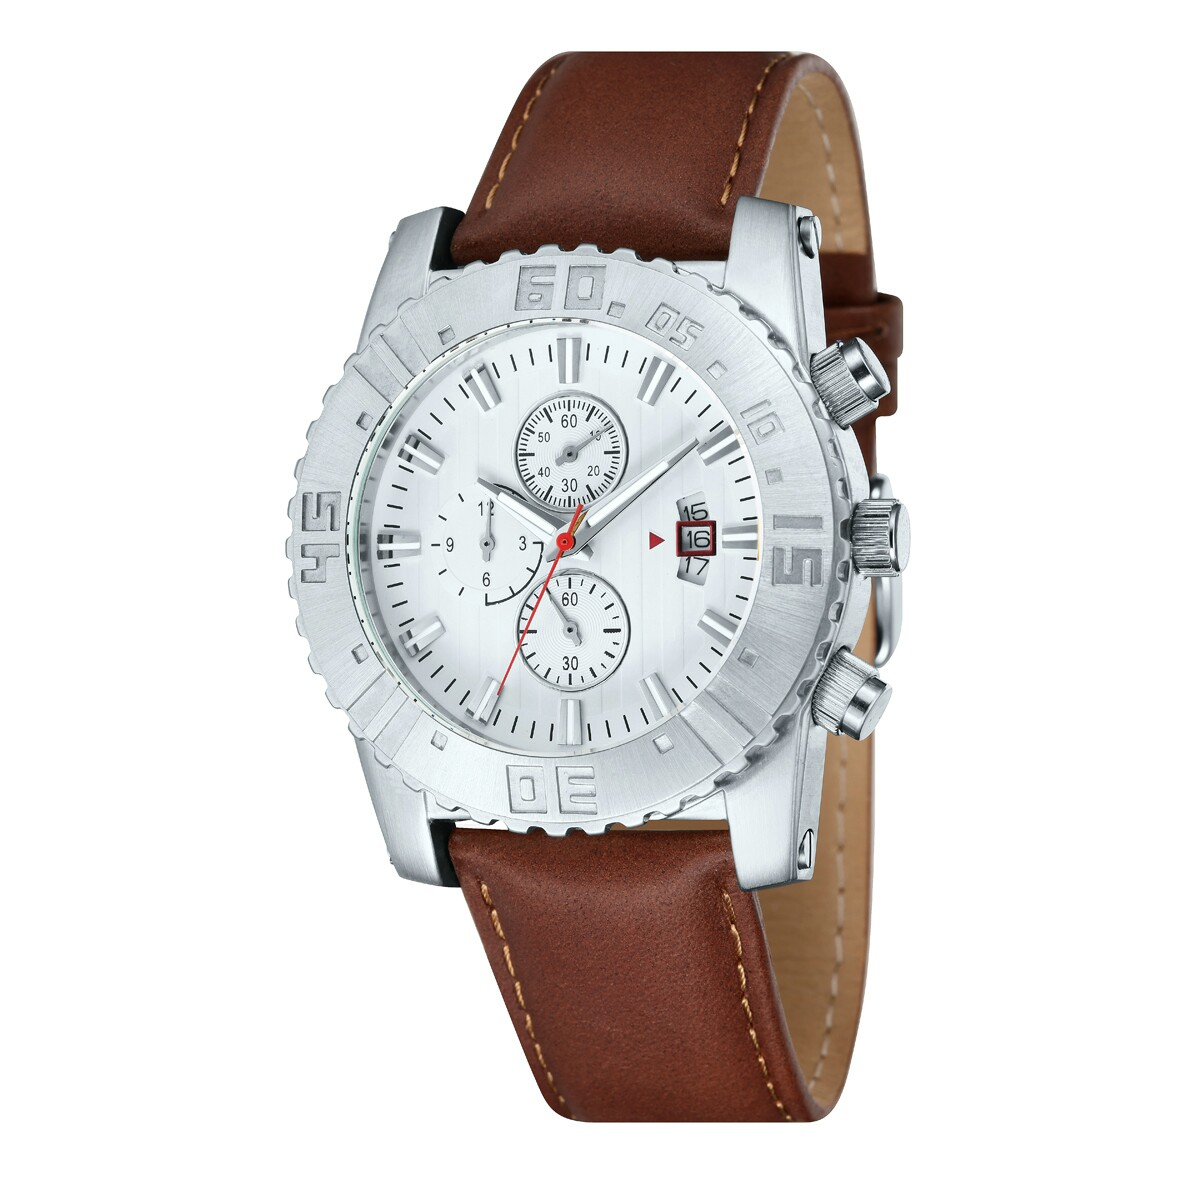 Werbeartikel: Chronographen Uhrwerk echtes Lederarmband.